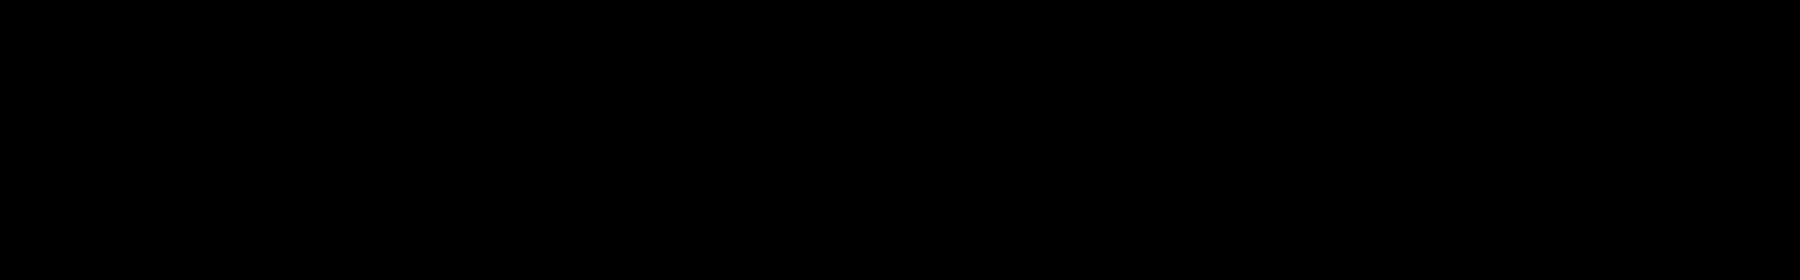 AAA Game Character Dark Lord audio waveform